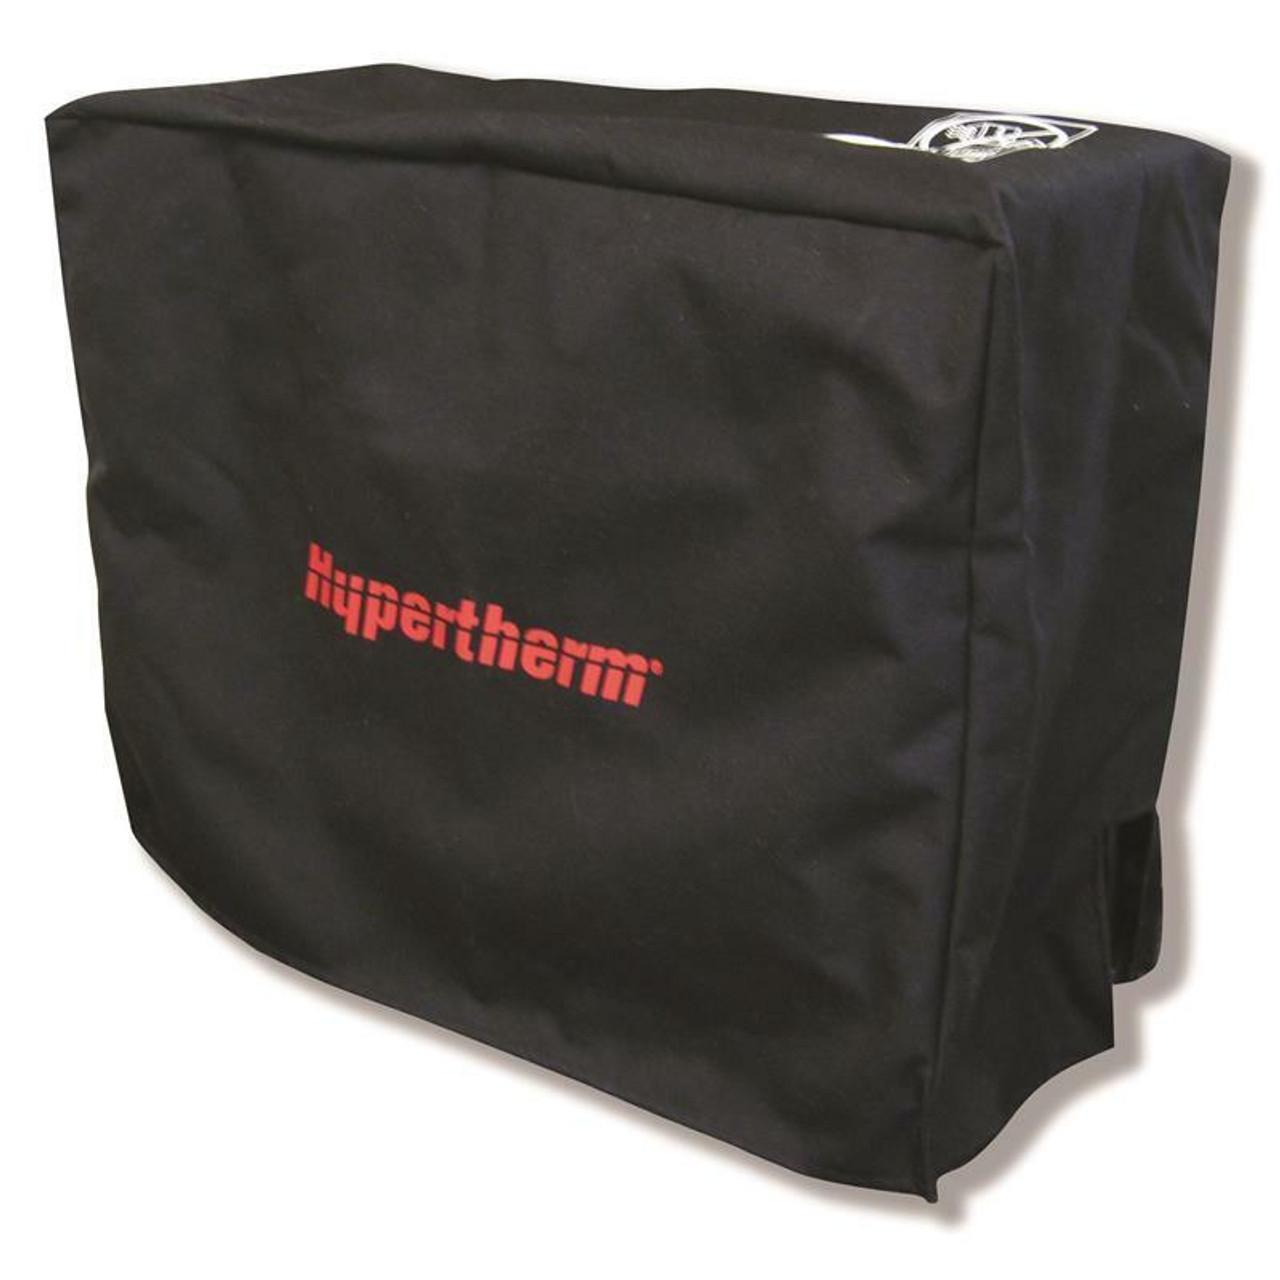 Hypertherm Powermax 45 Plasma Cutter Dust Cover